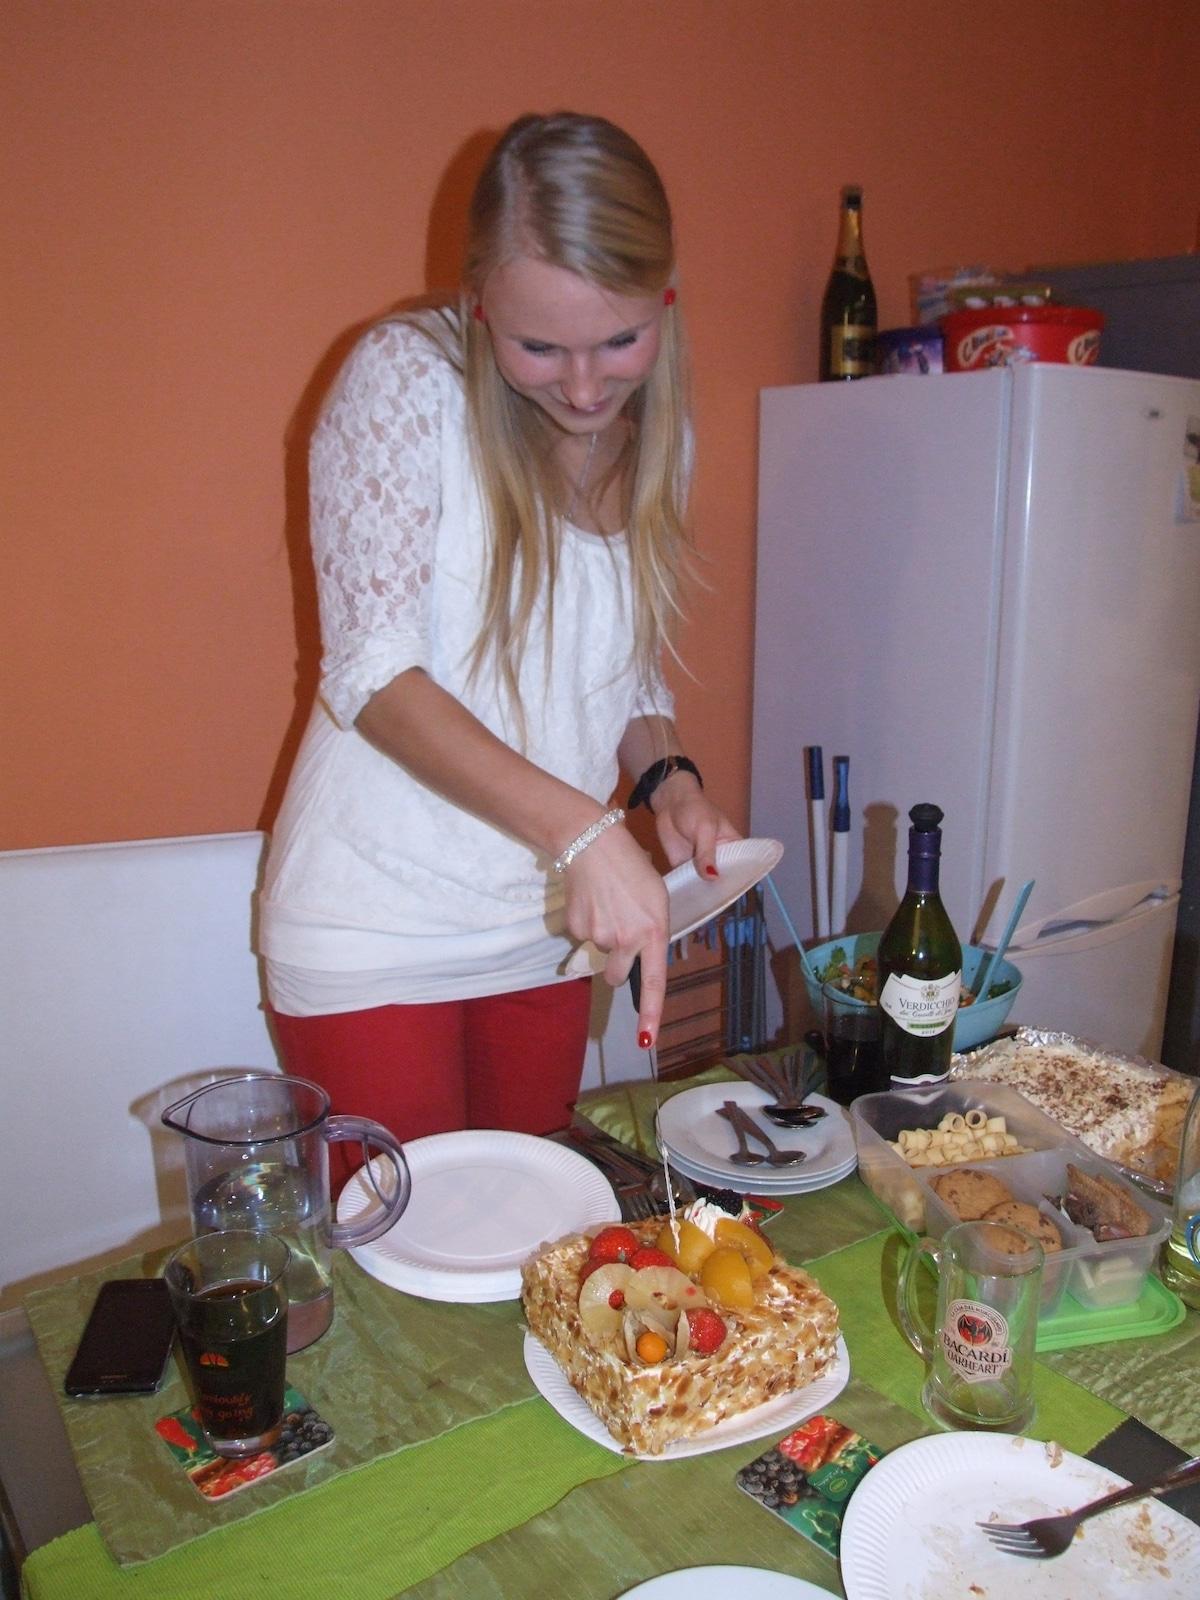 Paulina from Hemel Hempstead